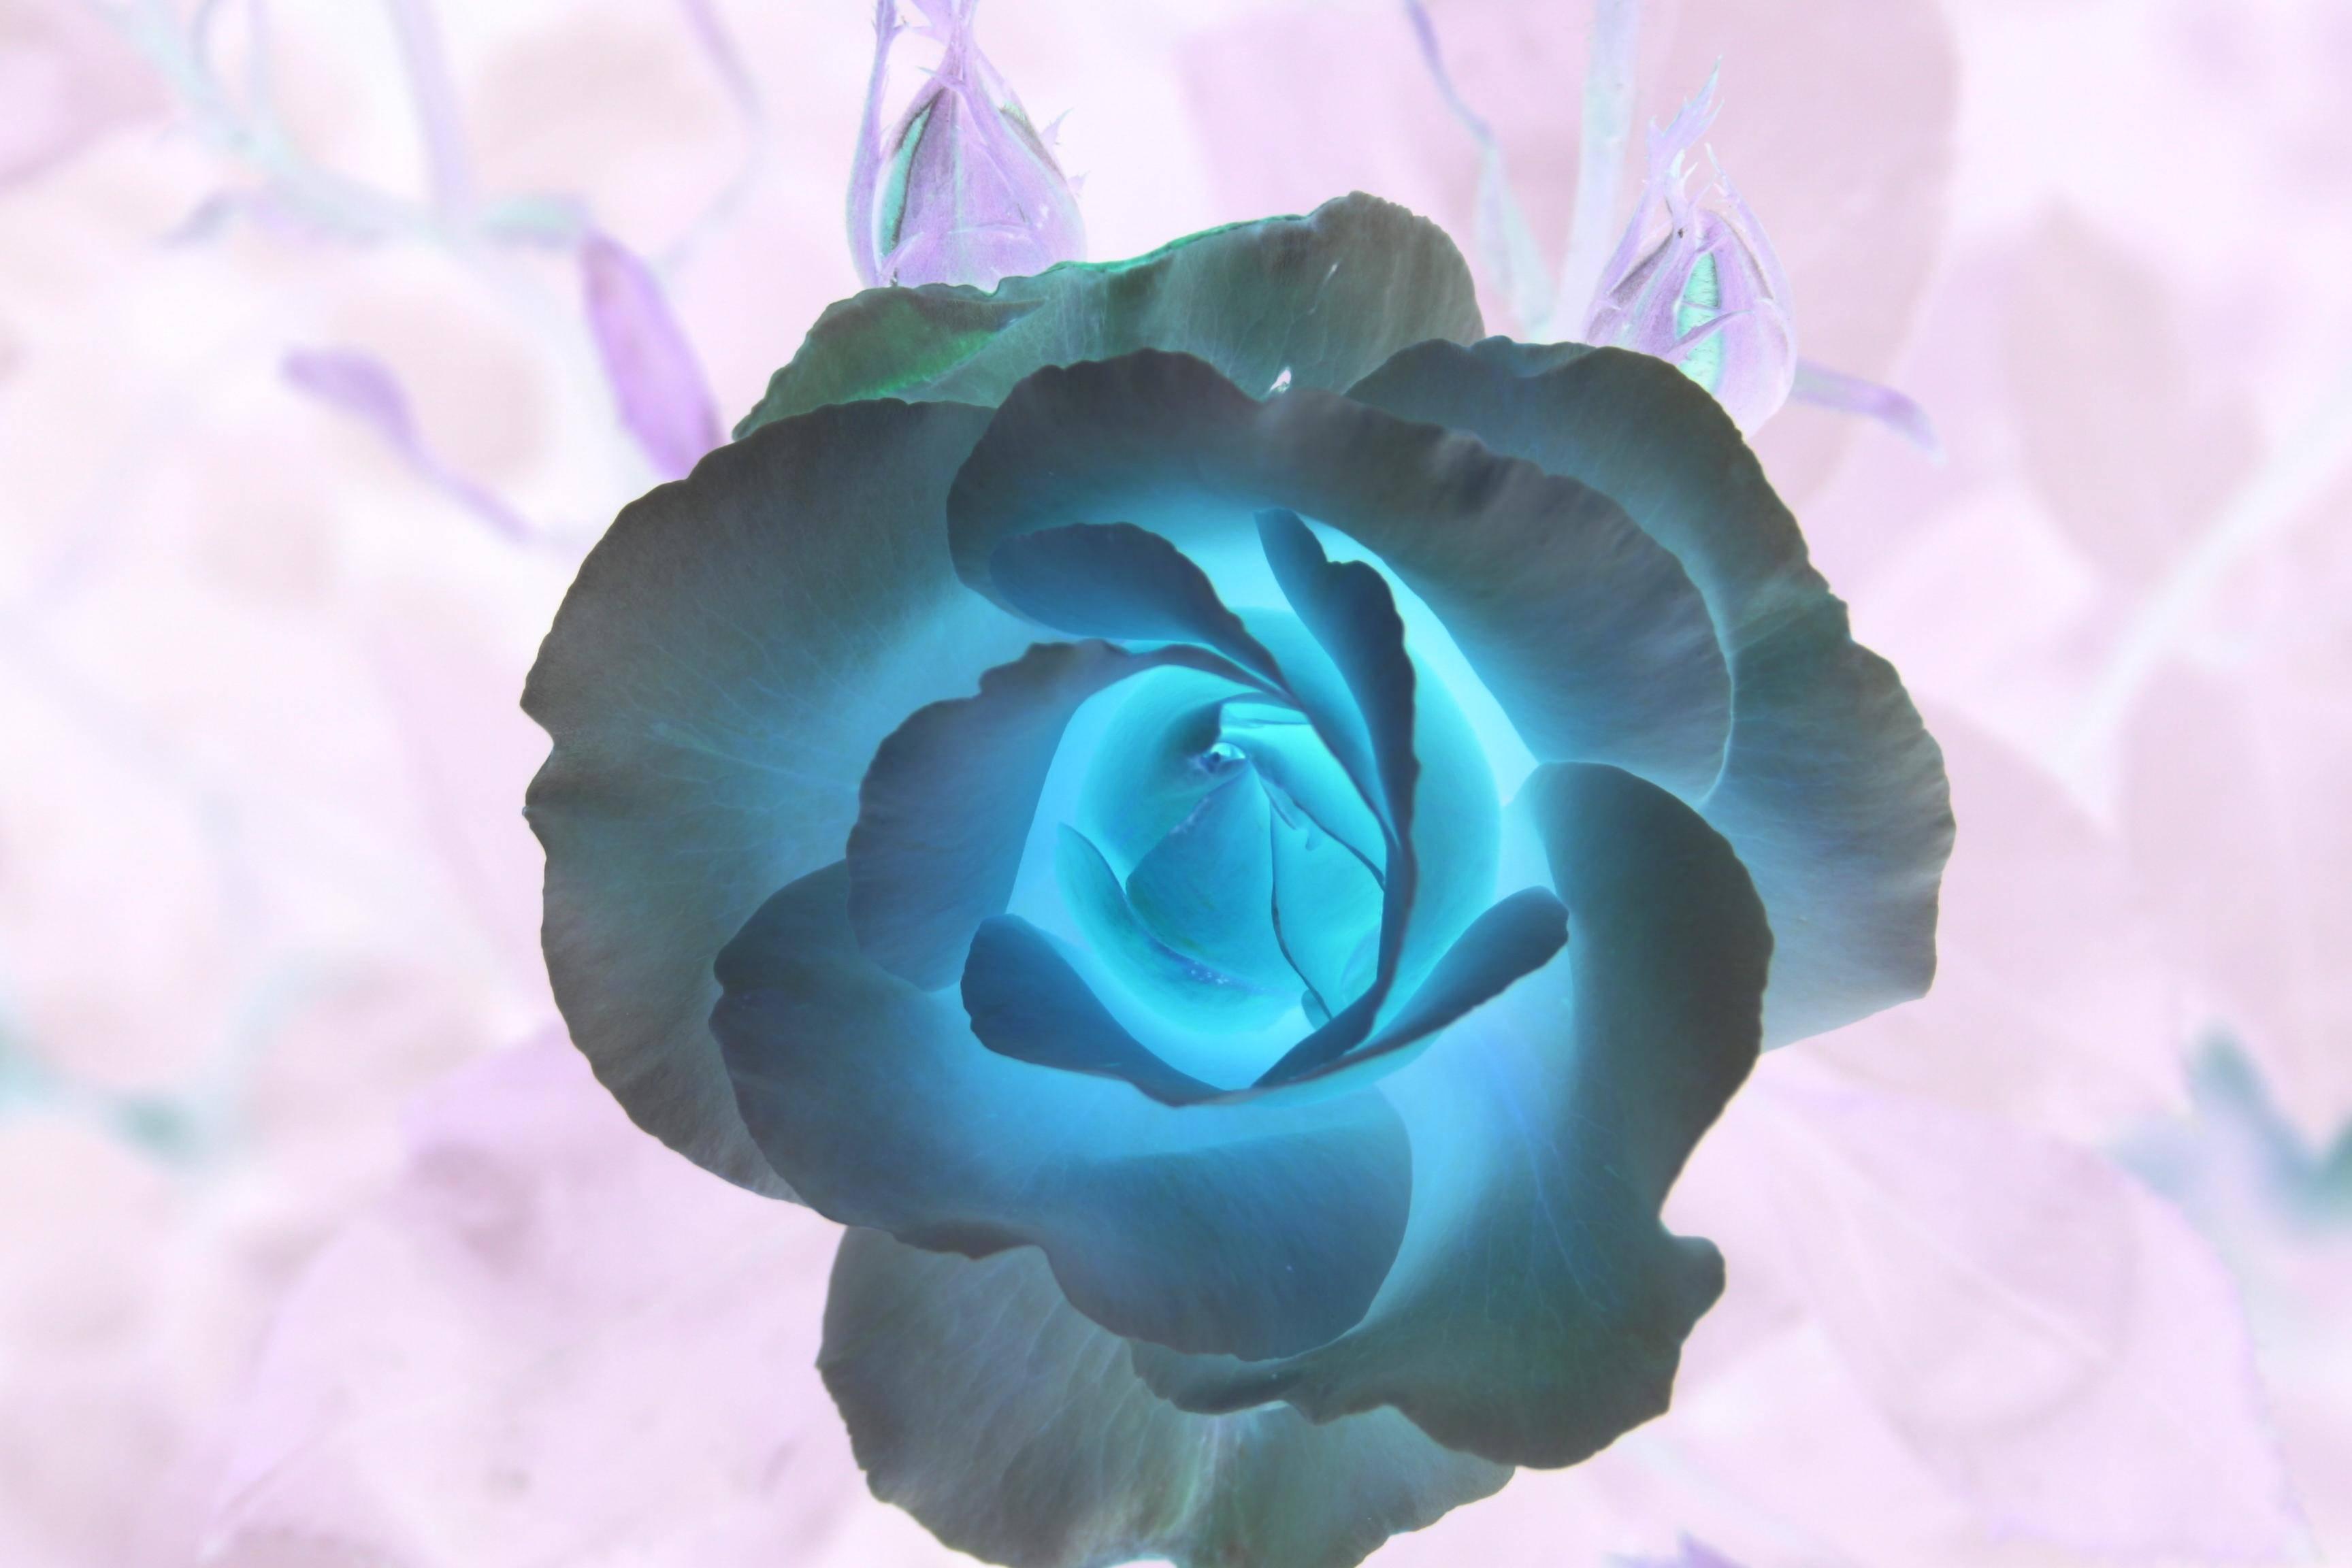 rose rose 02